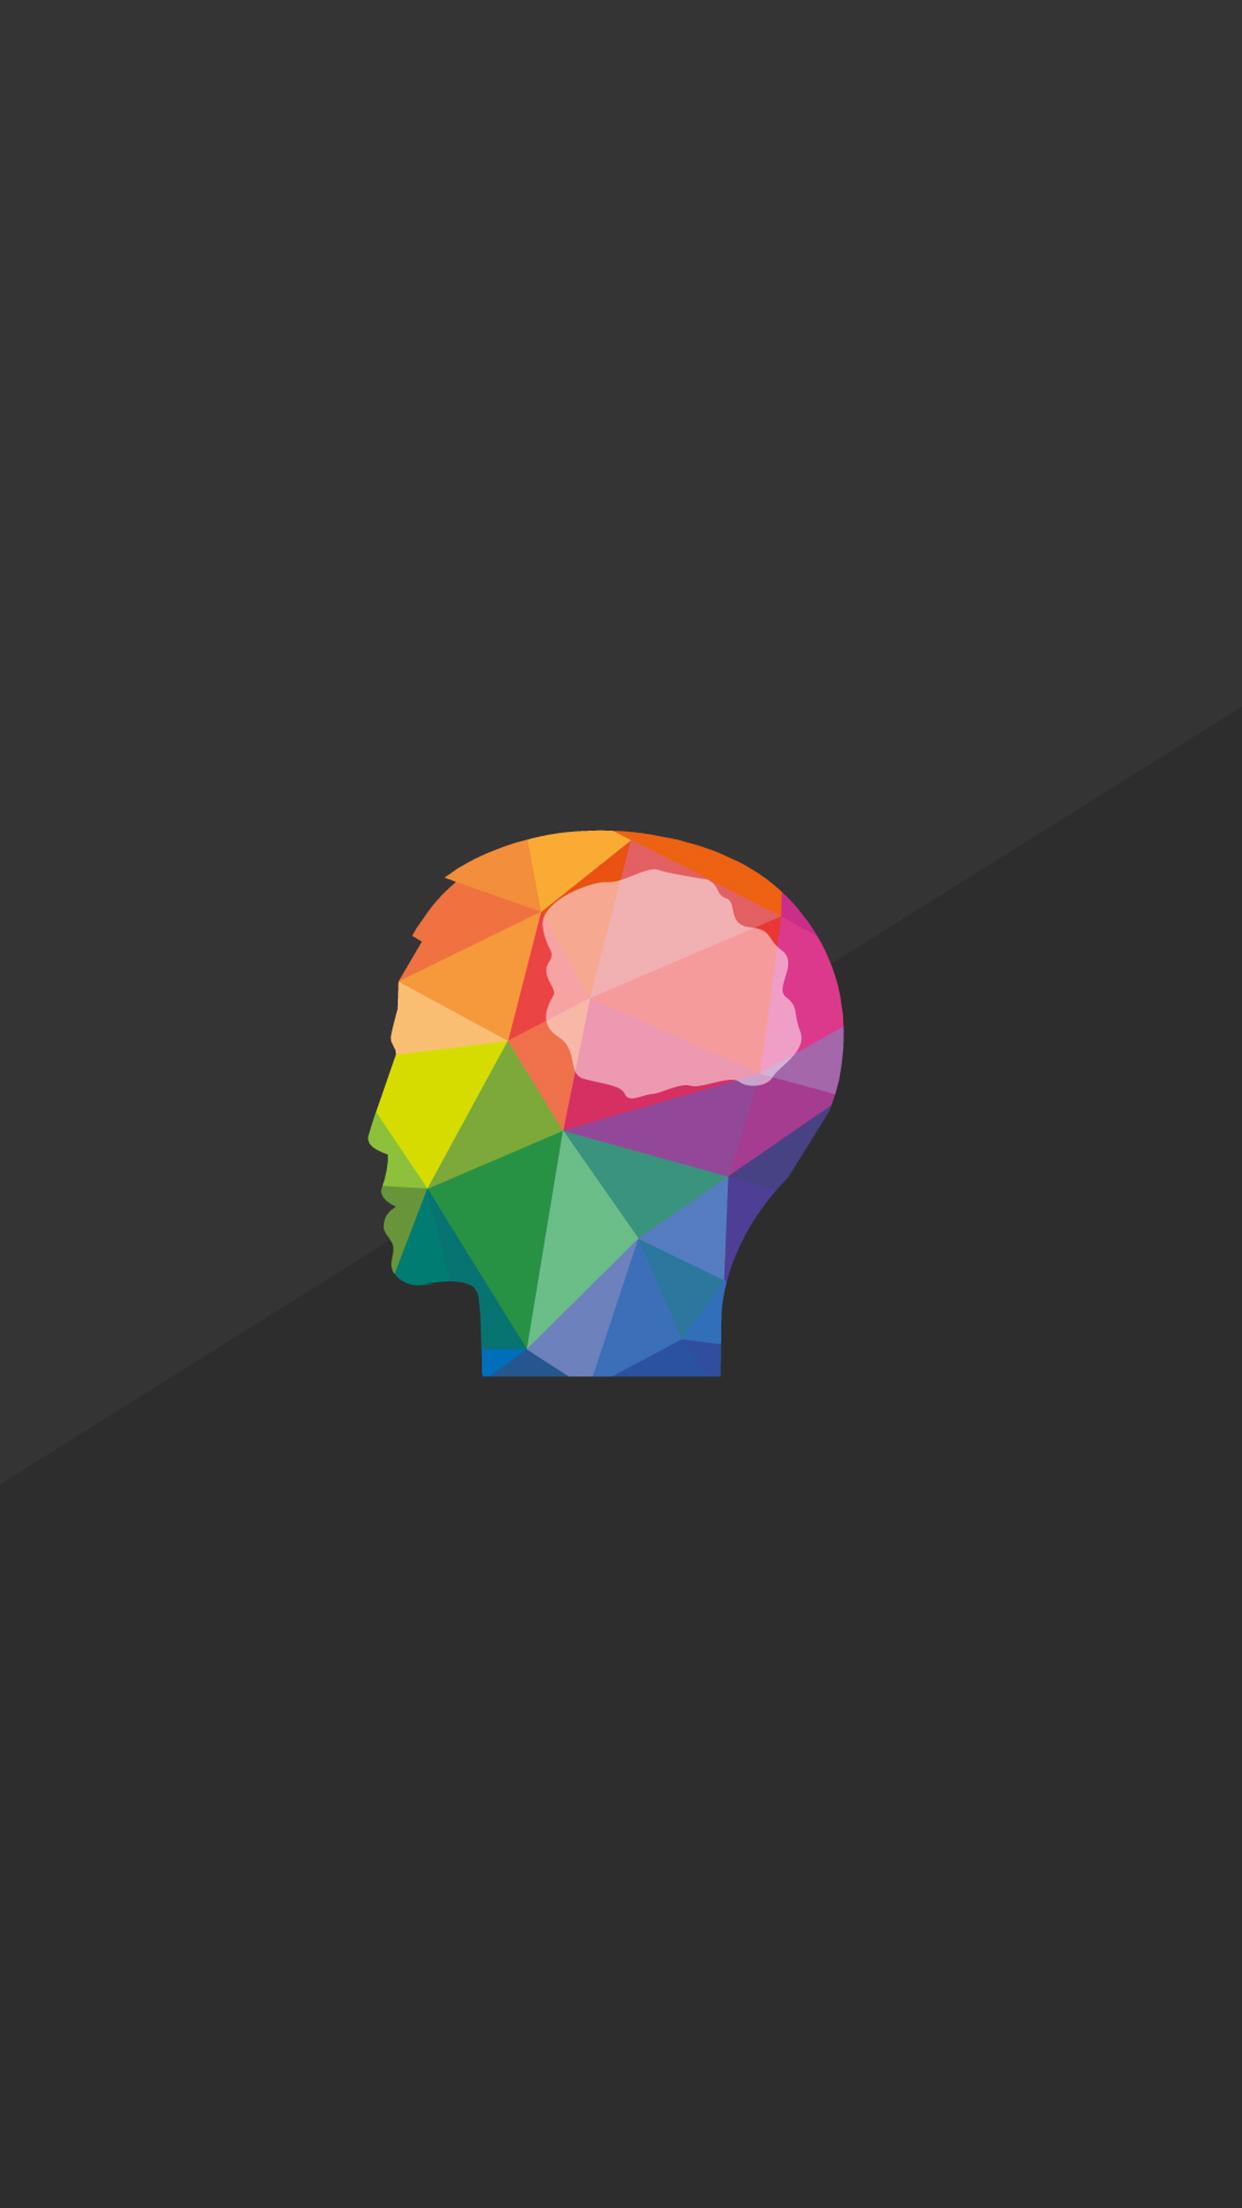 abstract brain wallpaper mind - photo #32